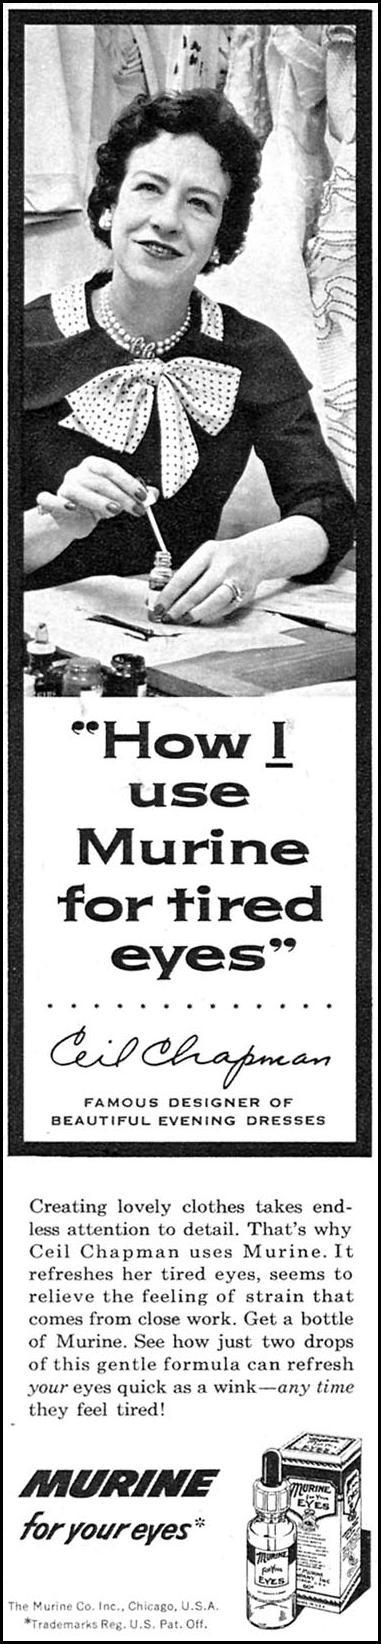 MURINE EYE DROPS FAMILY CIRCLE 02/01/1956 p. 18